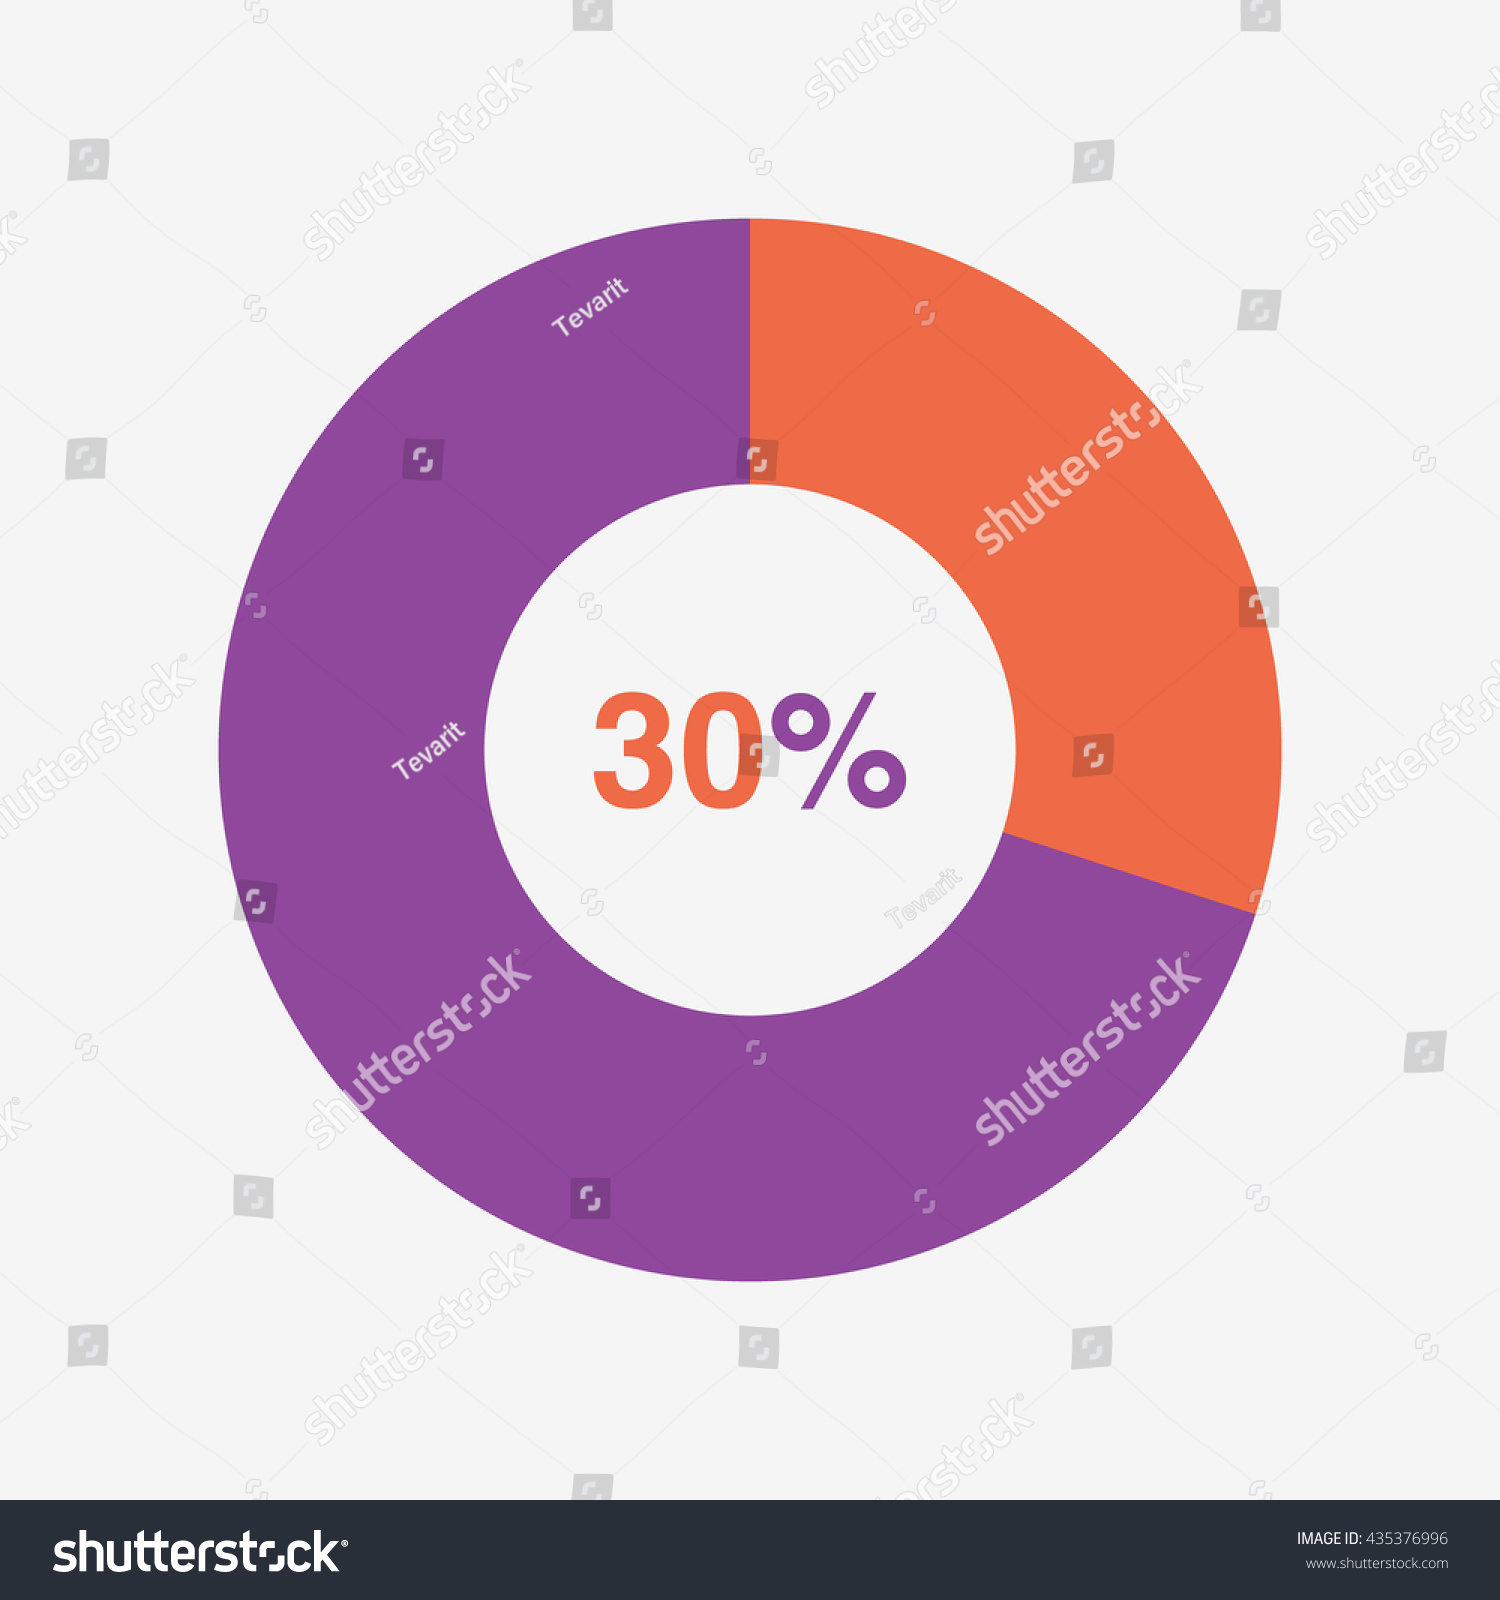 Icon pie orange purple chart 30 stock vector 435376996 shutterstock icon pie orange and purple chart 30 percent pie chart vector nvjuhfo Choice Image